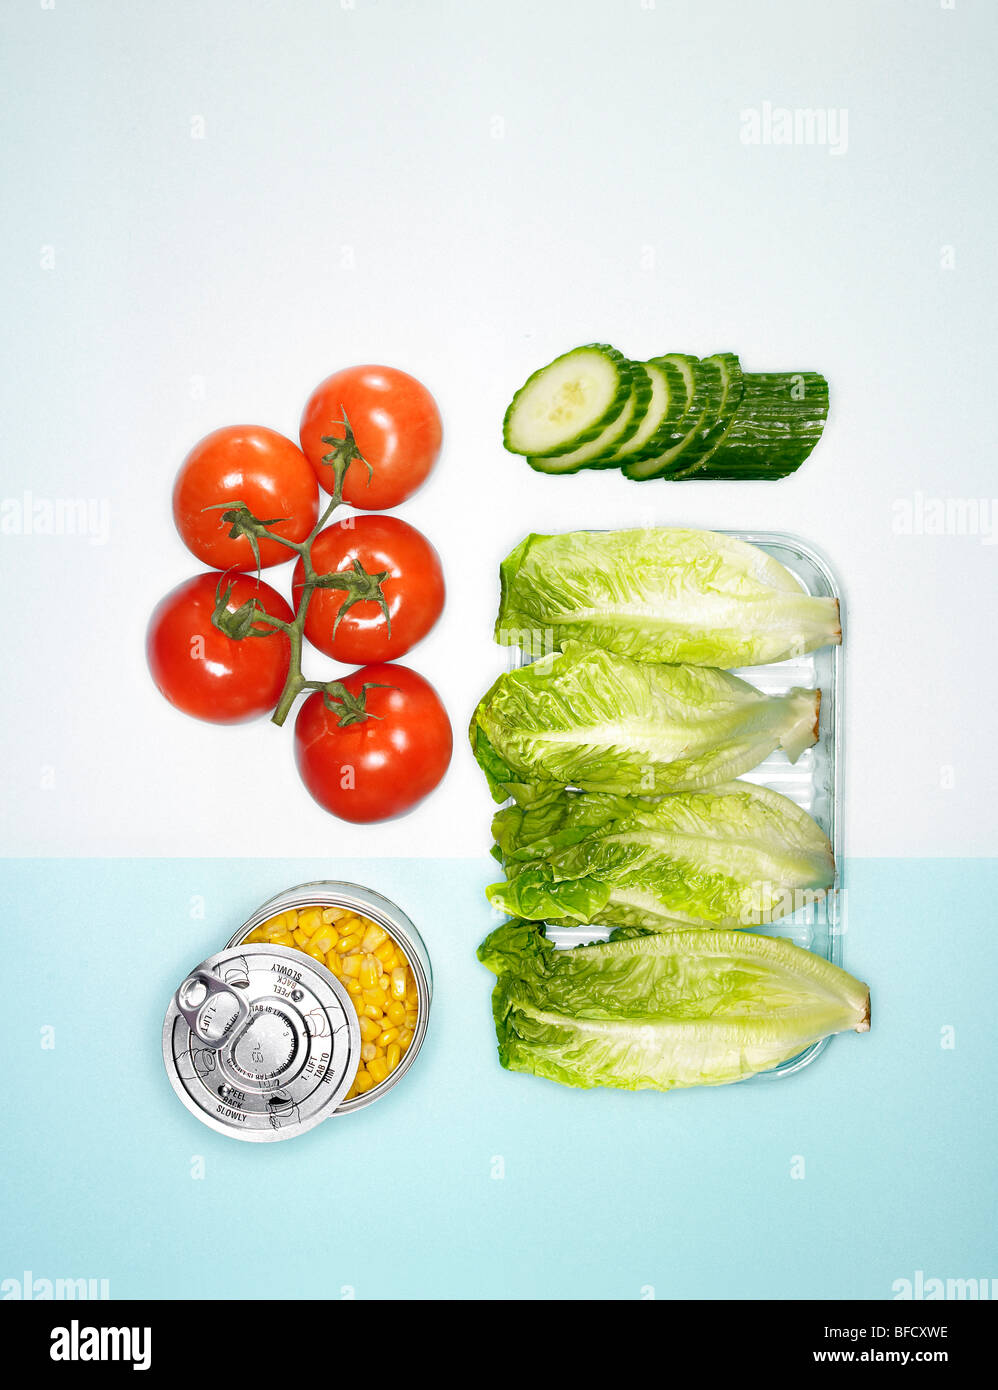 Rellenos de Sandwich, ensalada ingredientes Imagen De Stock